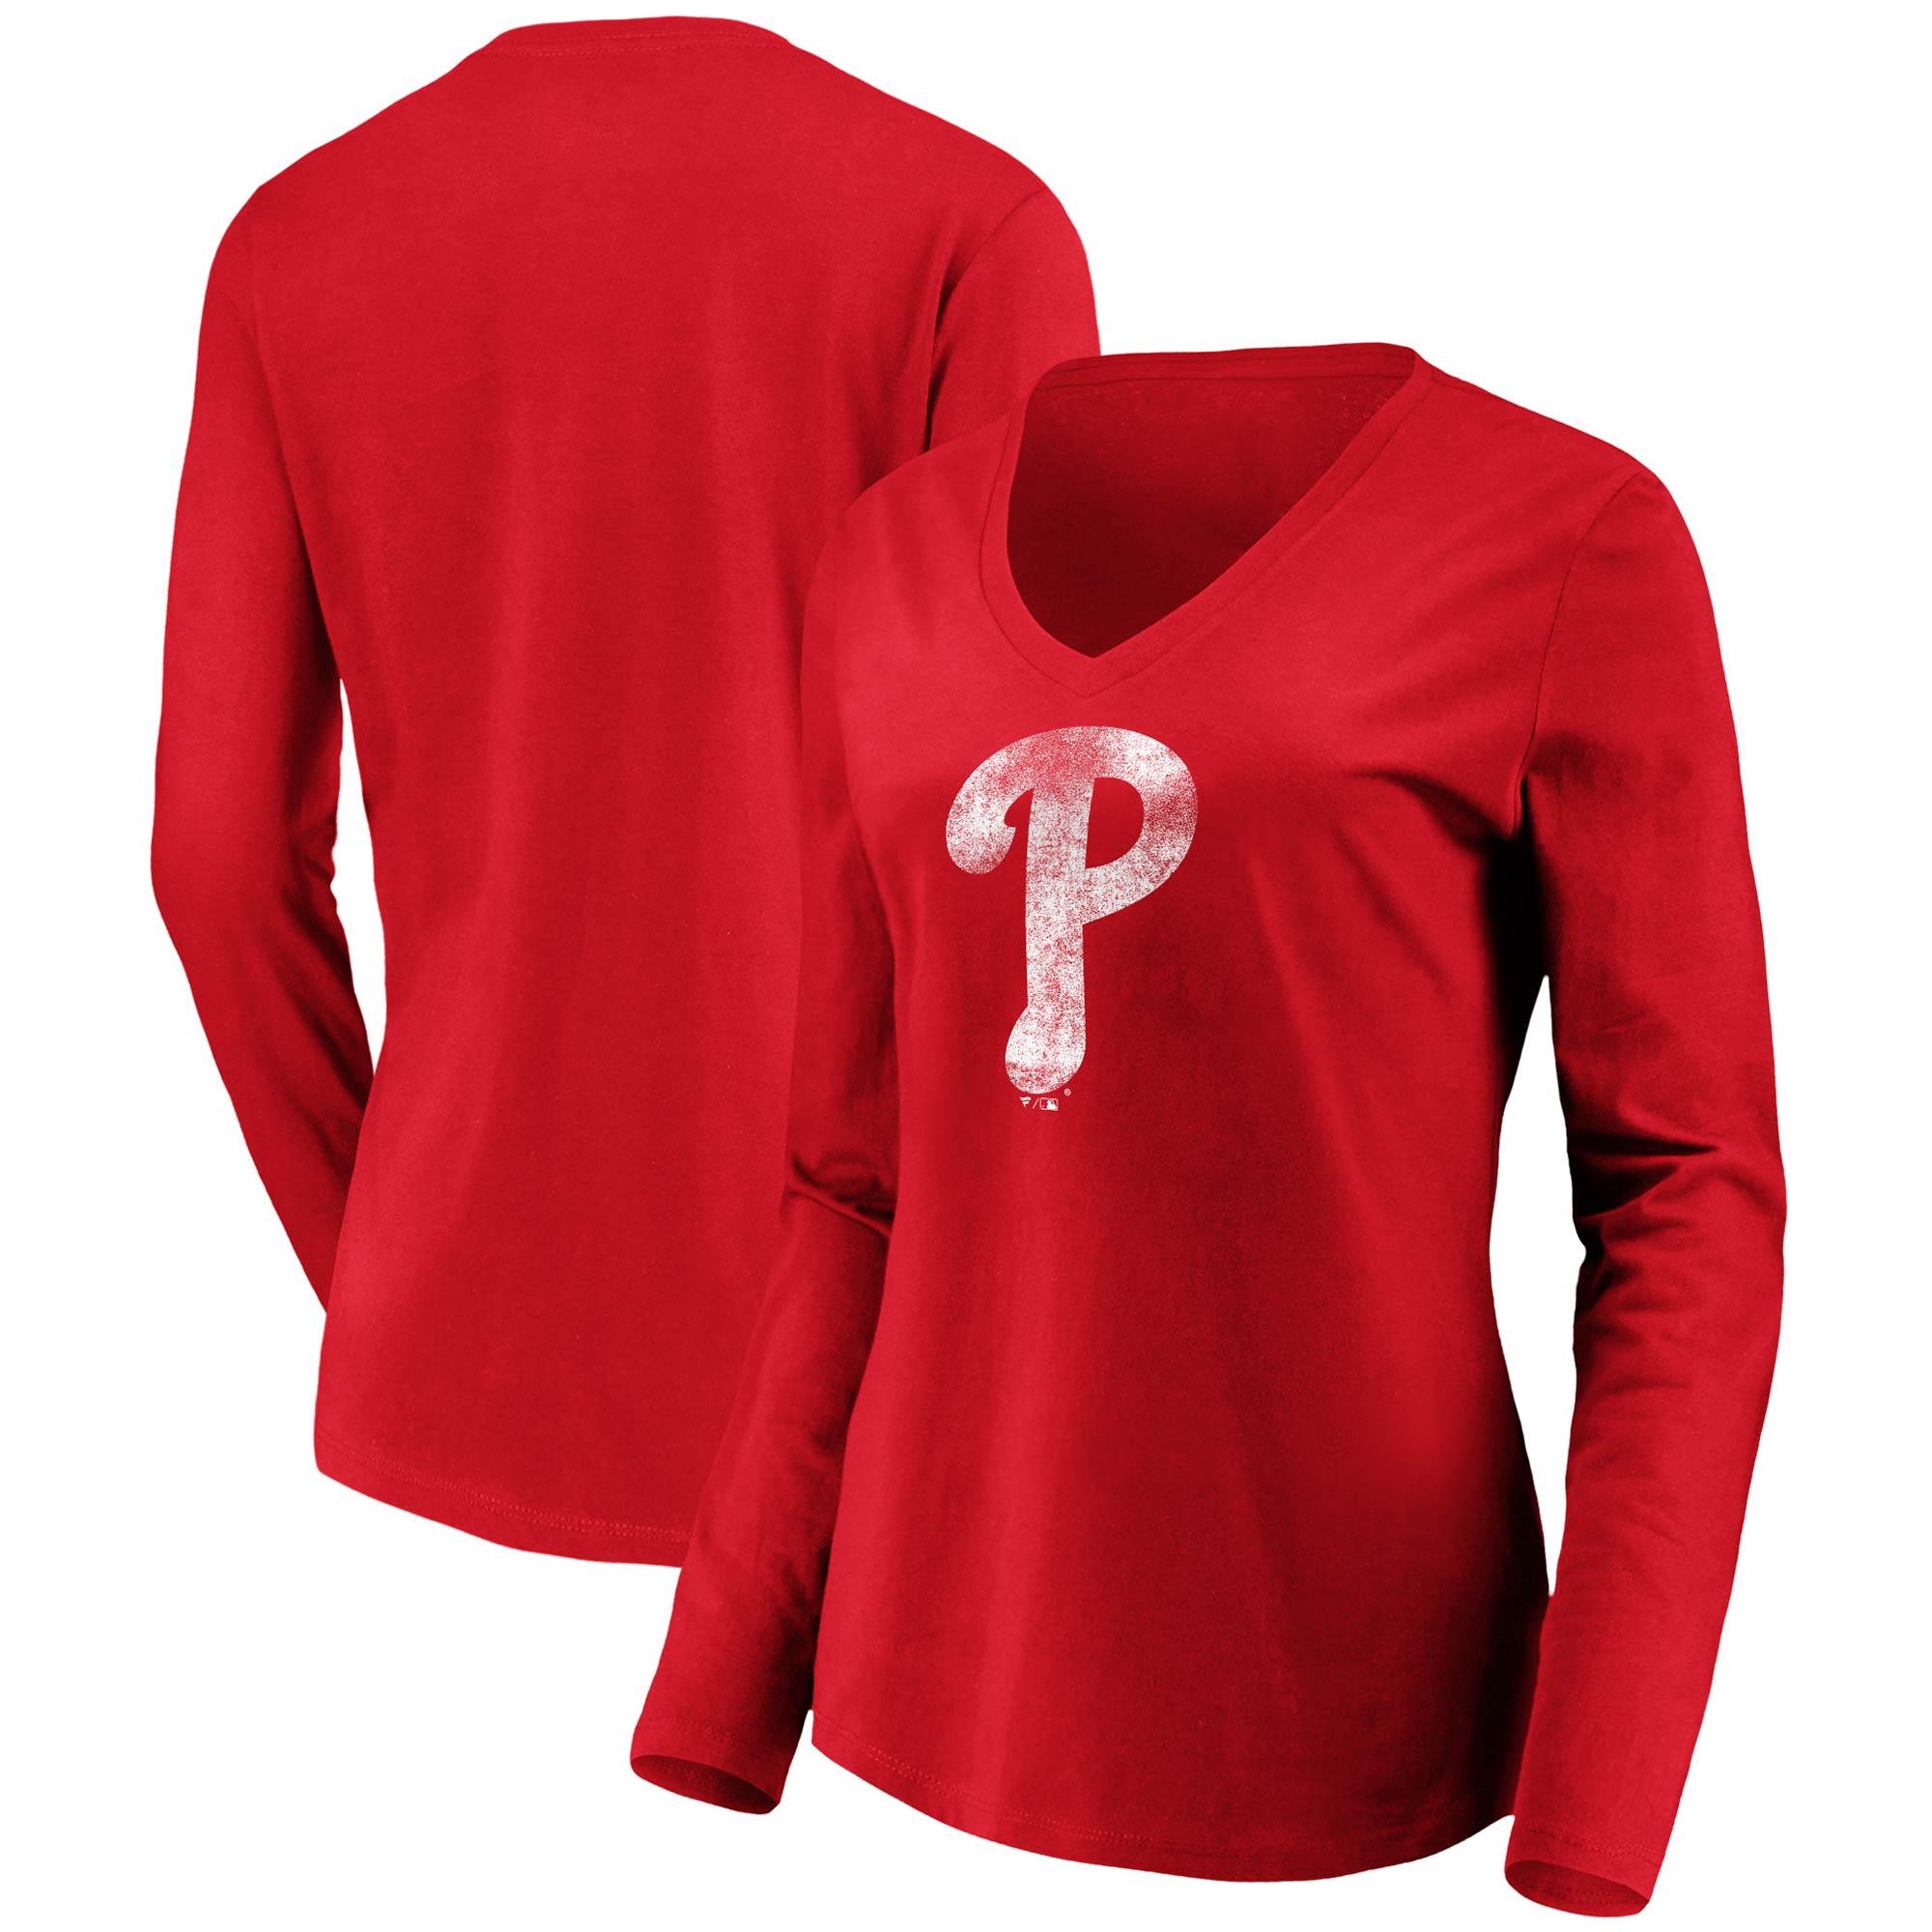 Philadelphia Phillies Fanatics Branded Women's Core Team Long Sleeve V-Neck T-Shirt - Red